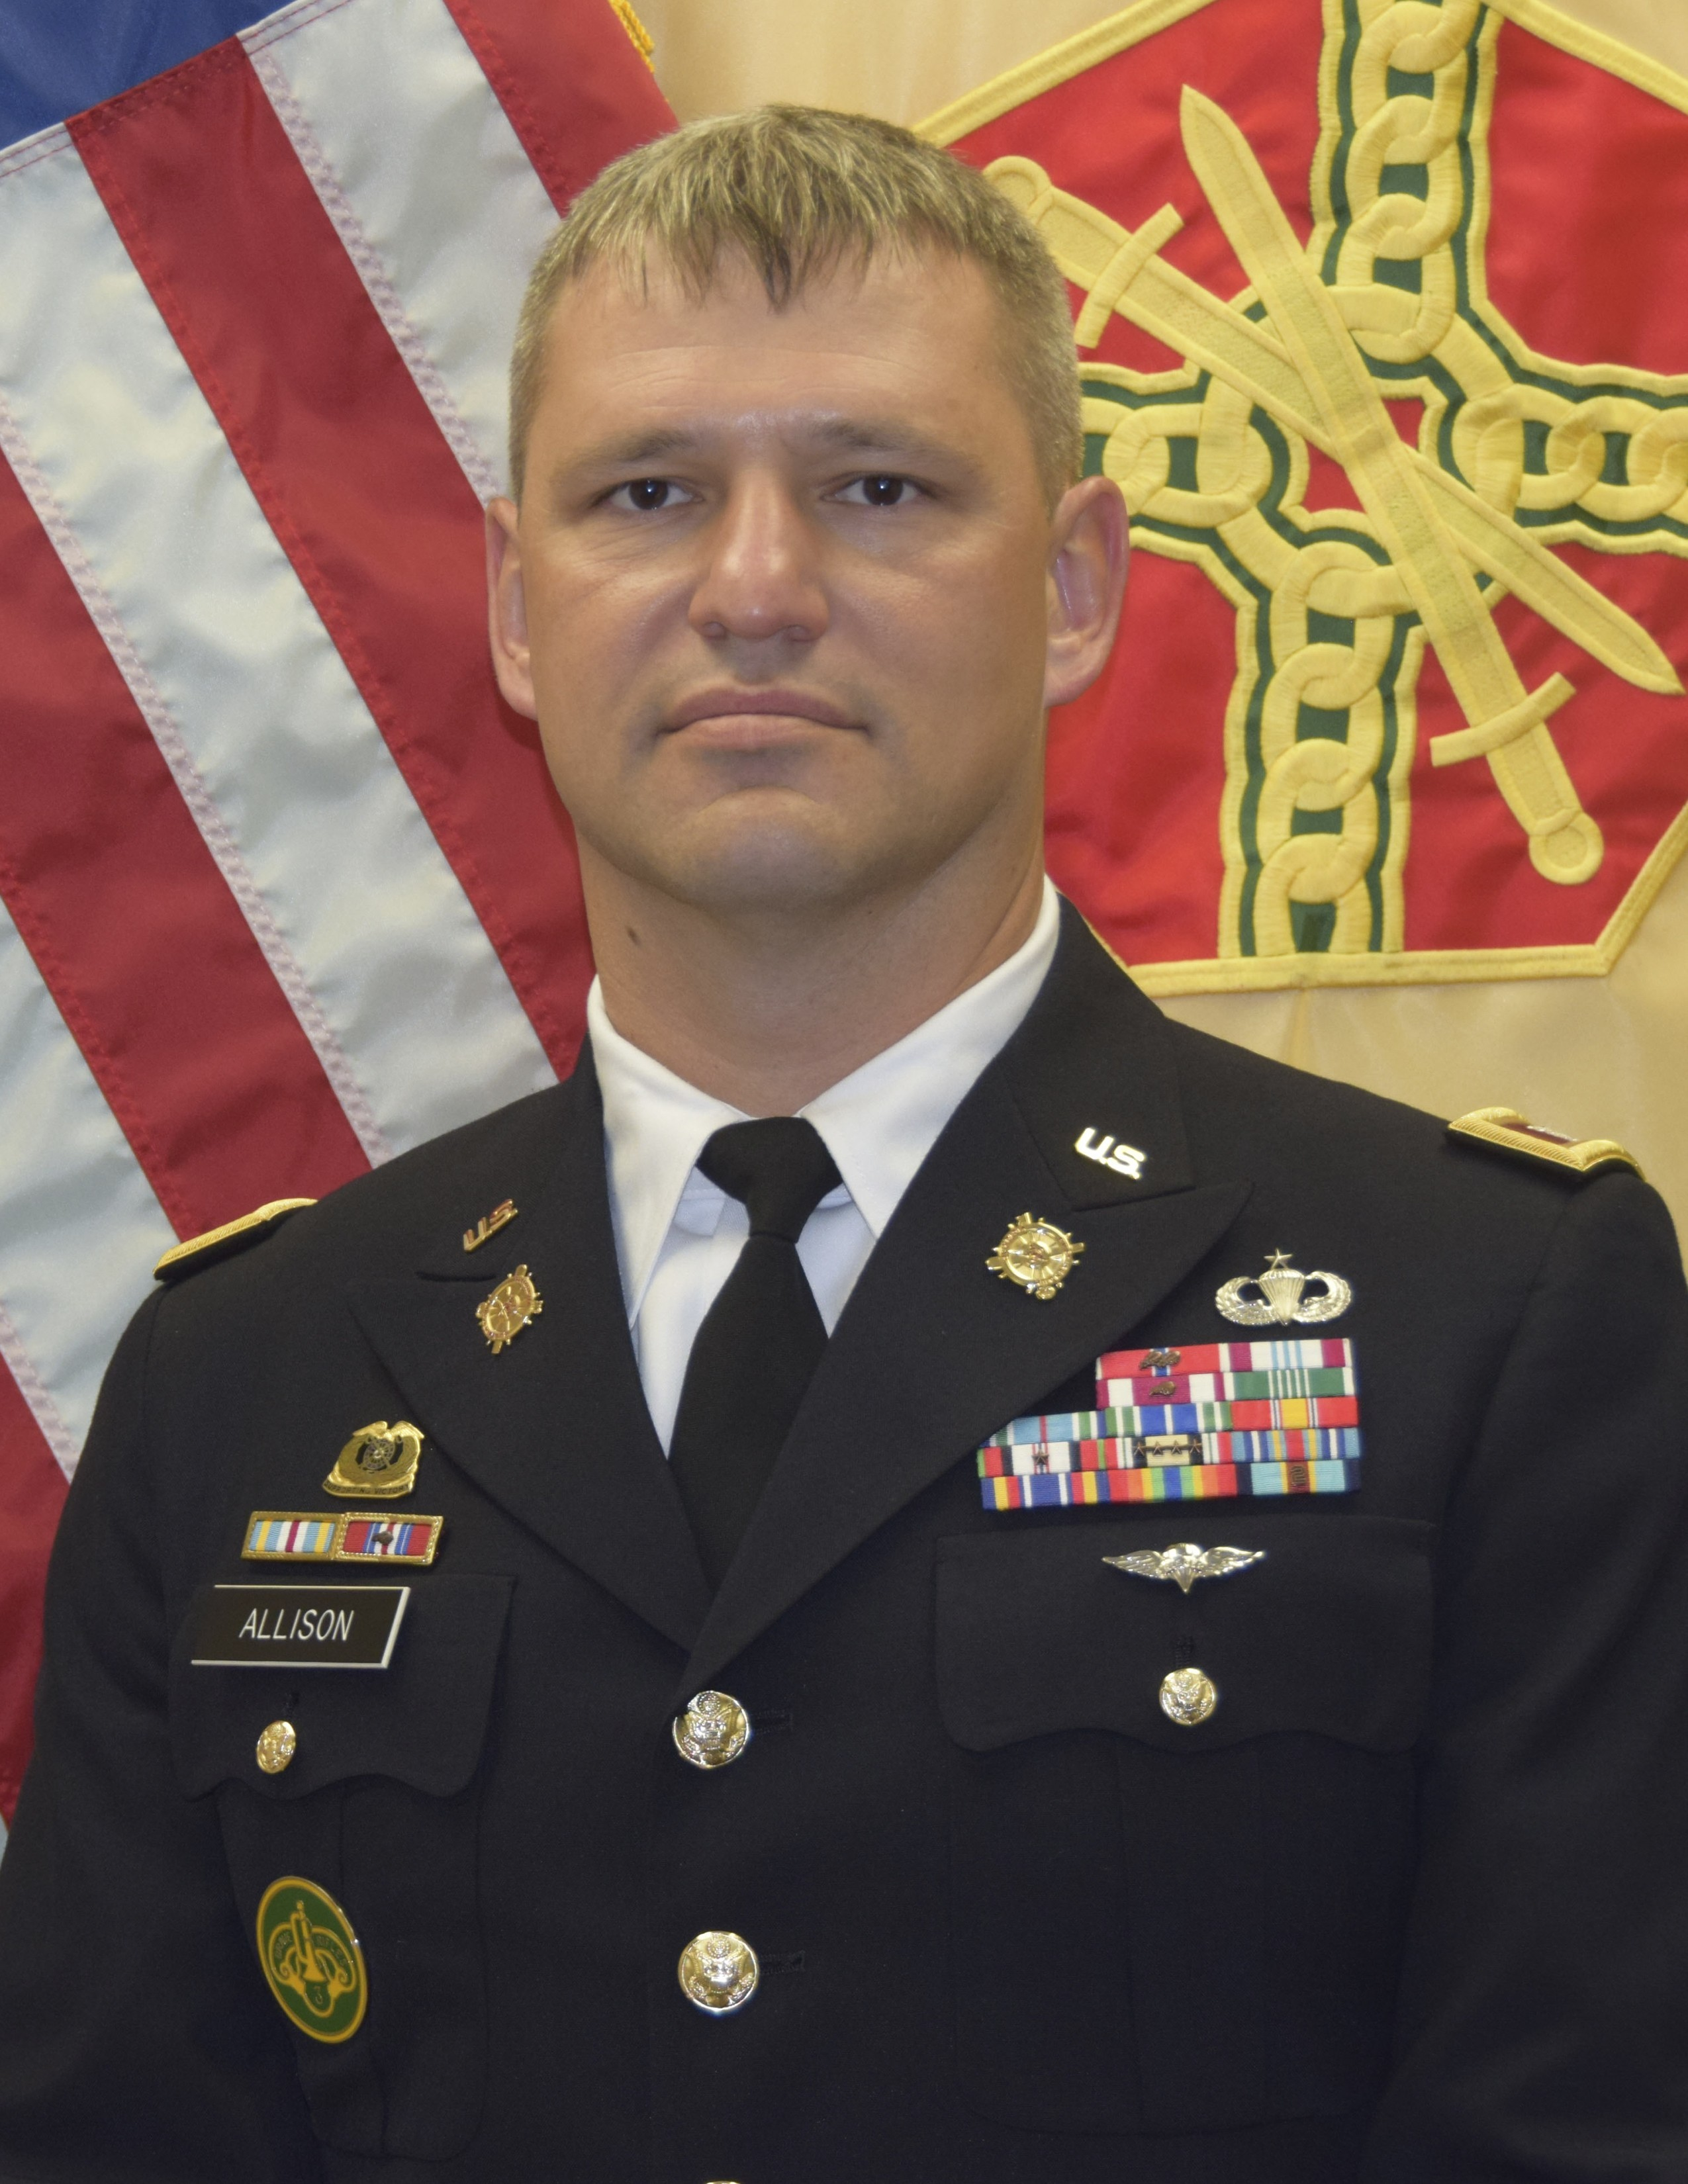 Col. Todd J. Allison